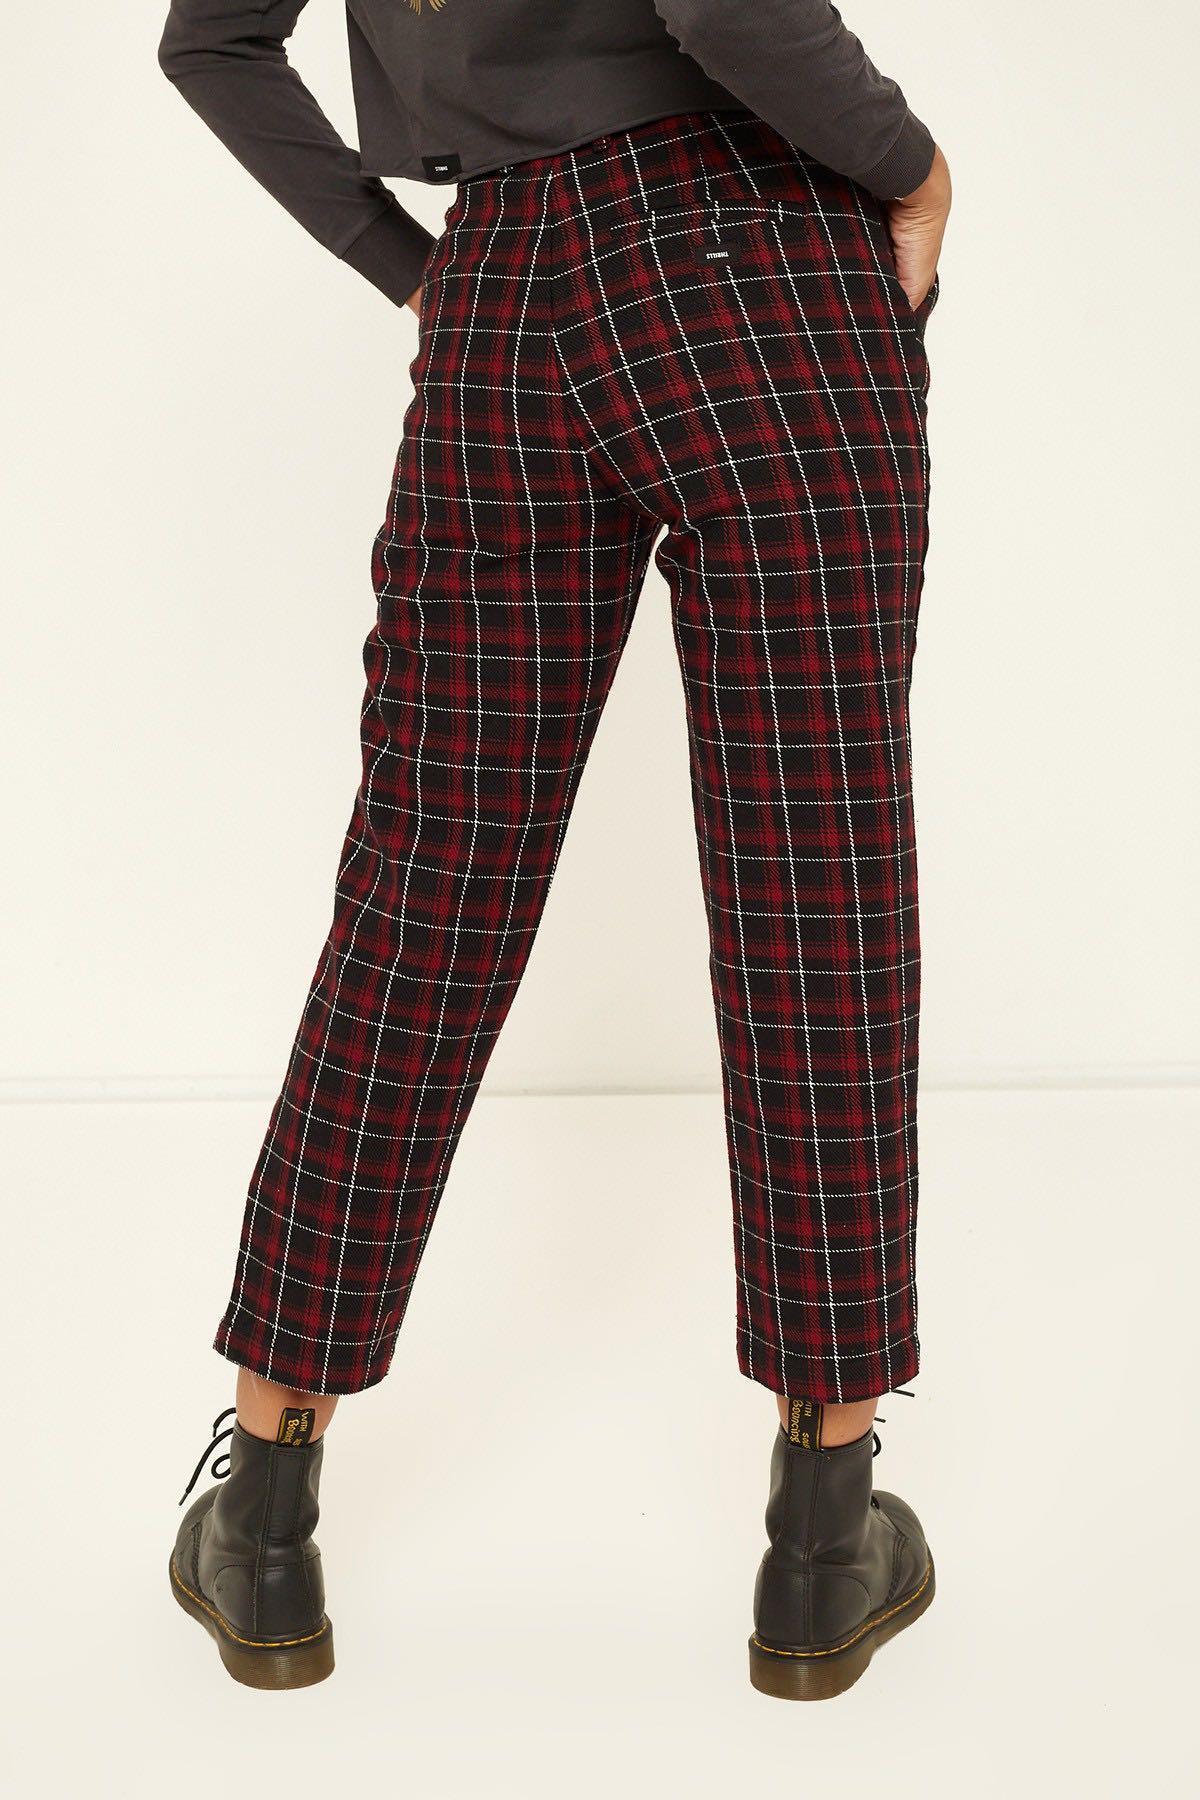 THRILLS Tartan Mom Pants